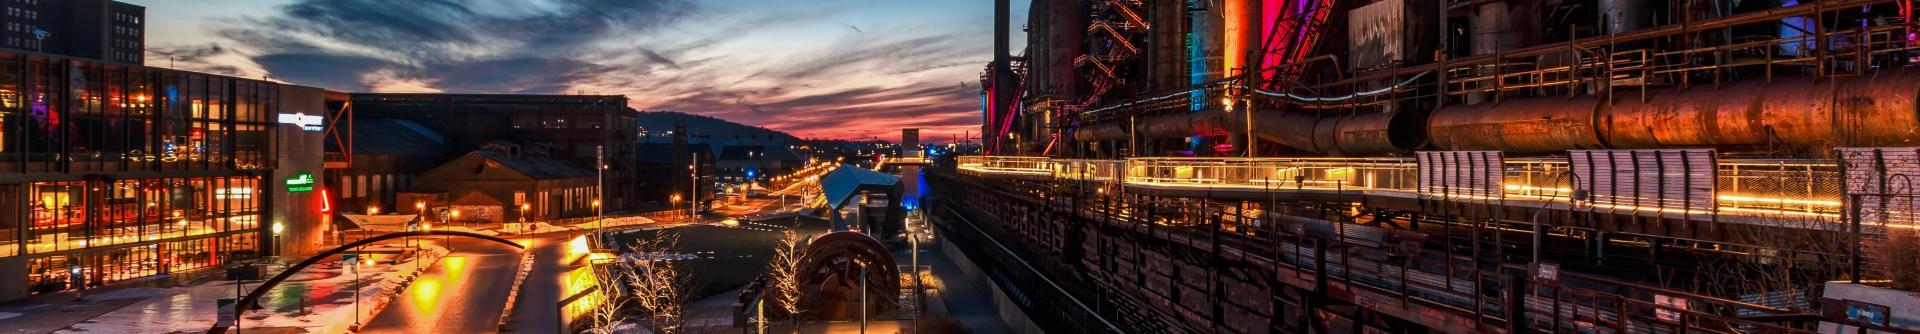 SteelStacks Sunset 01 Discover Lehigh Valley Jason Philibotte Overload Images